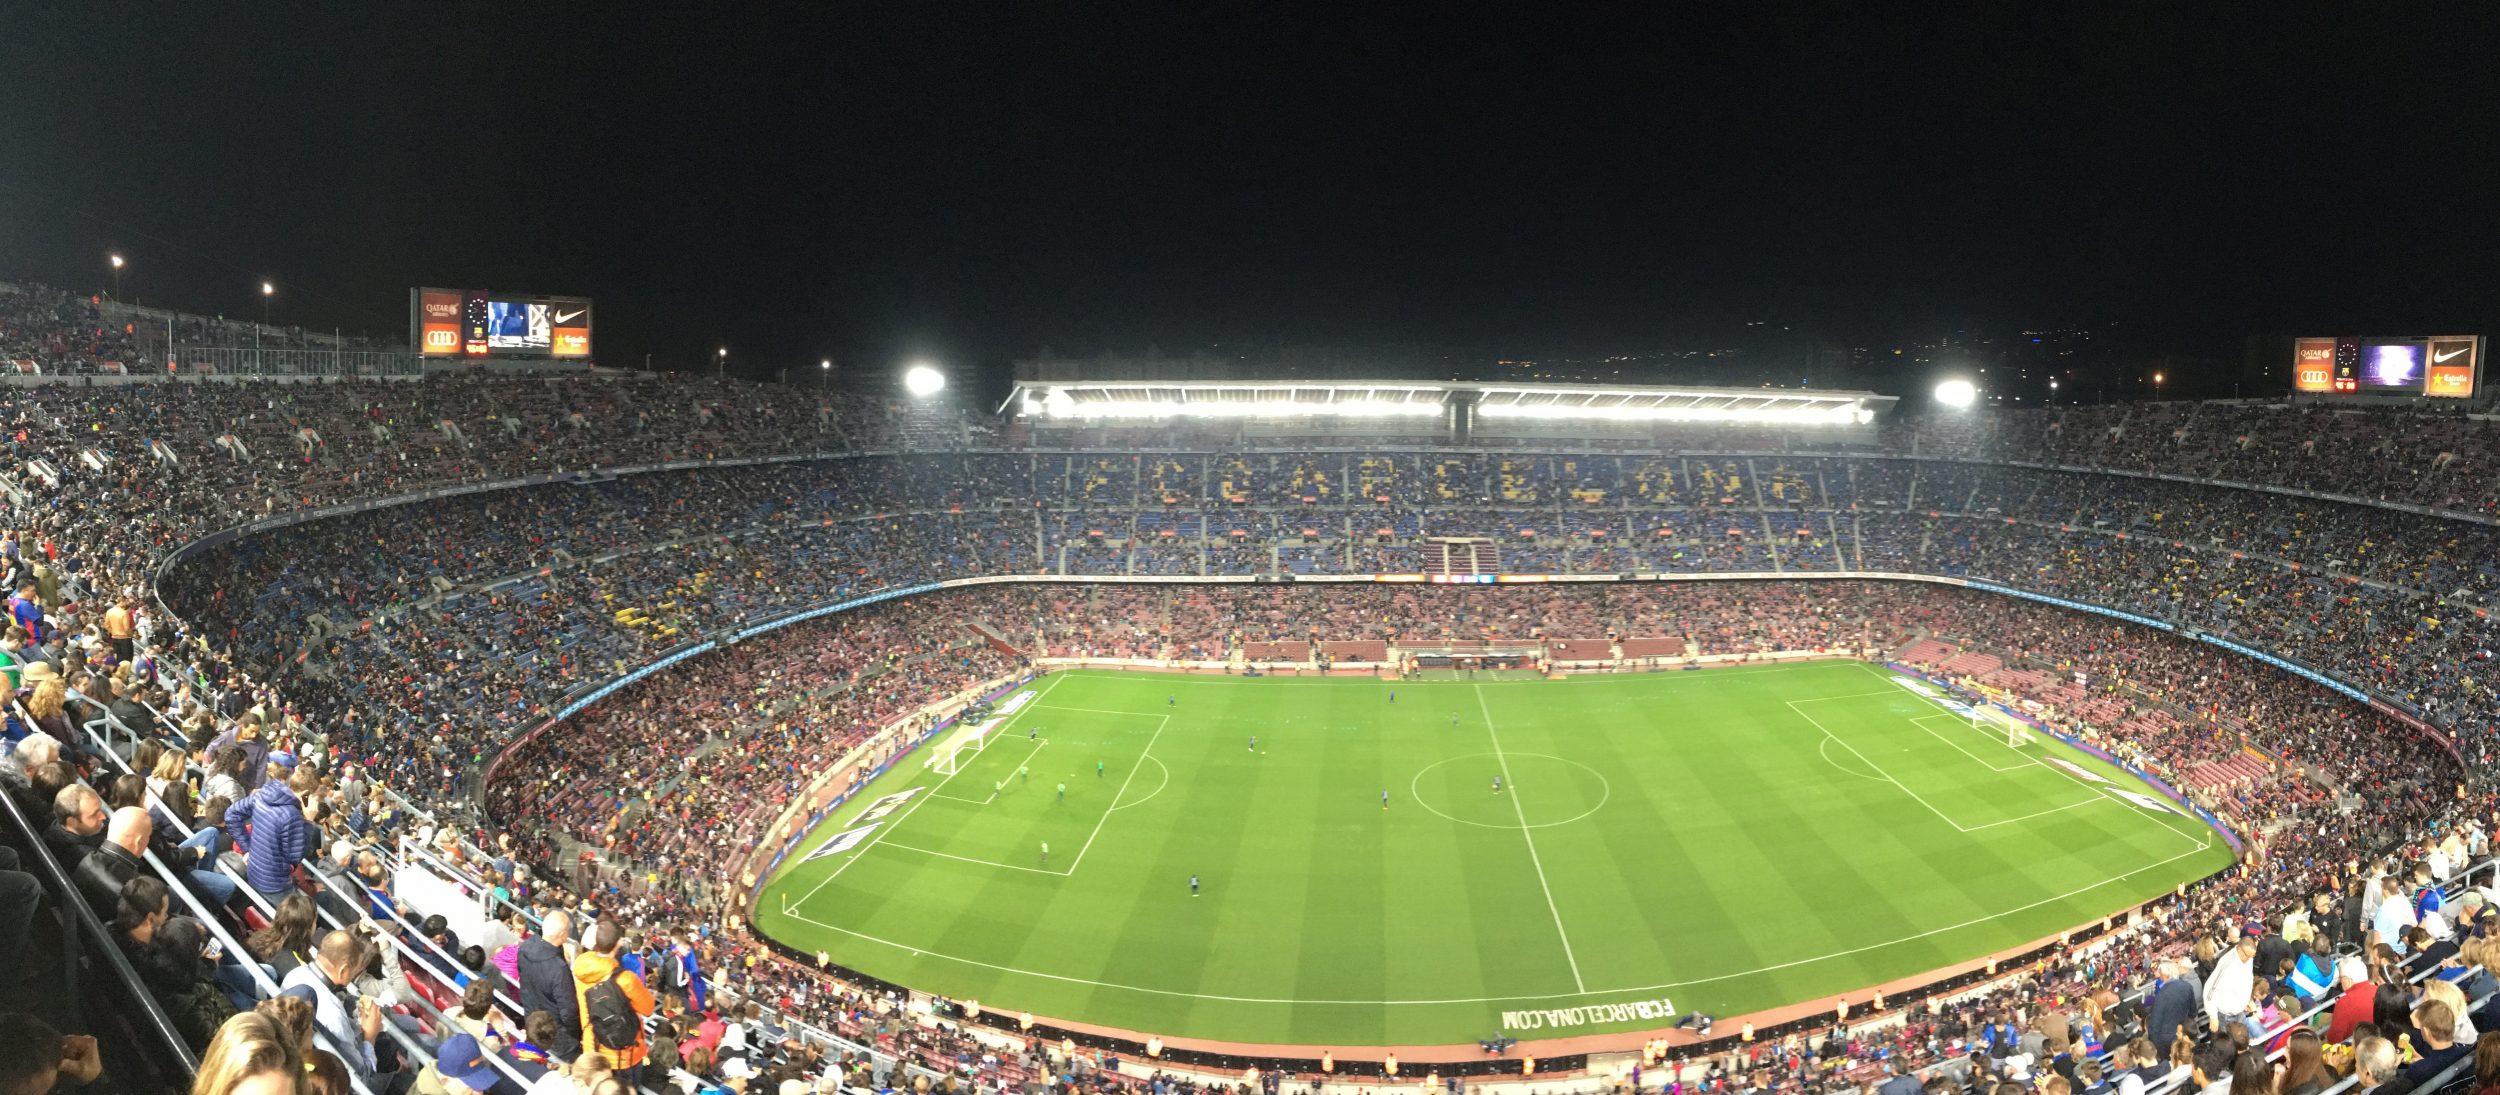 Camp Nou, thuisbasis van FC Barcelona